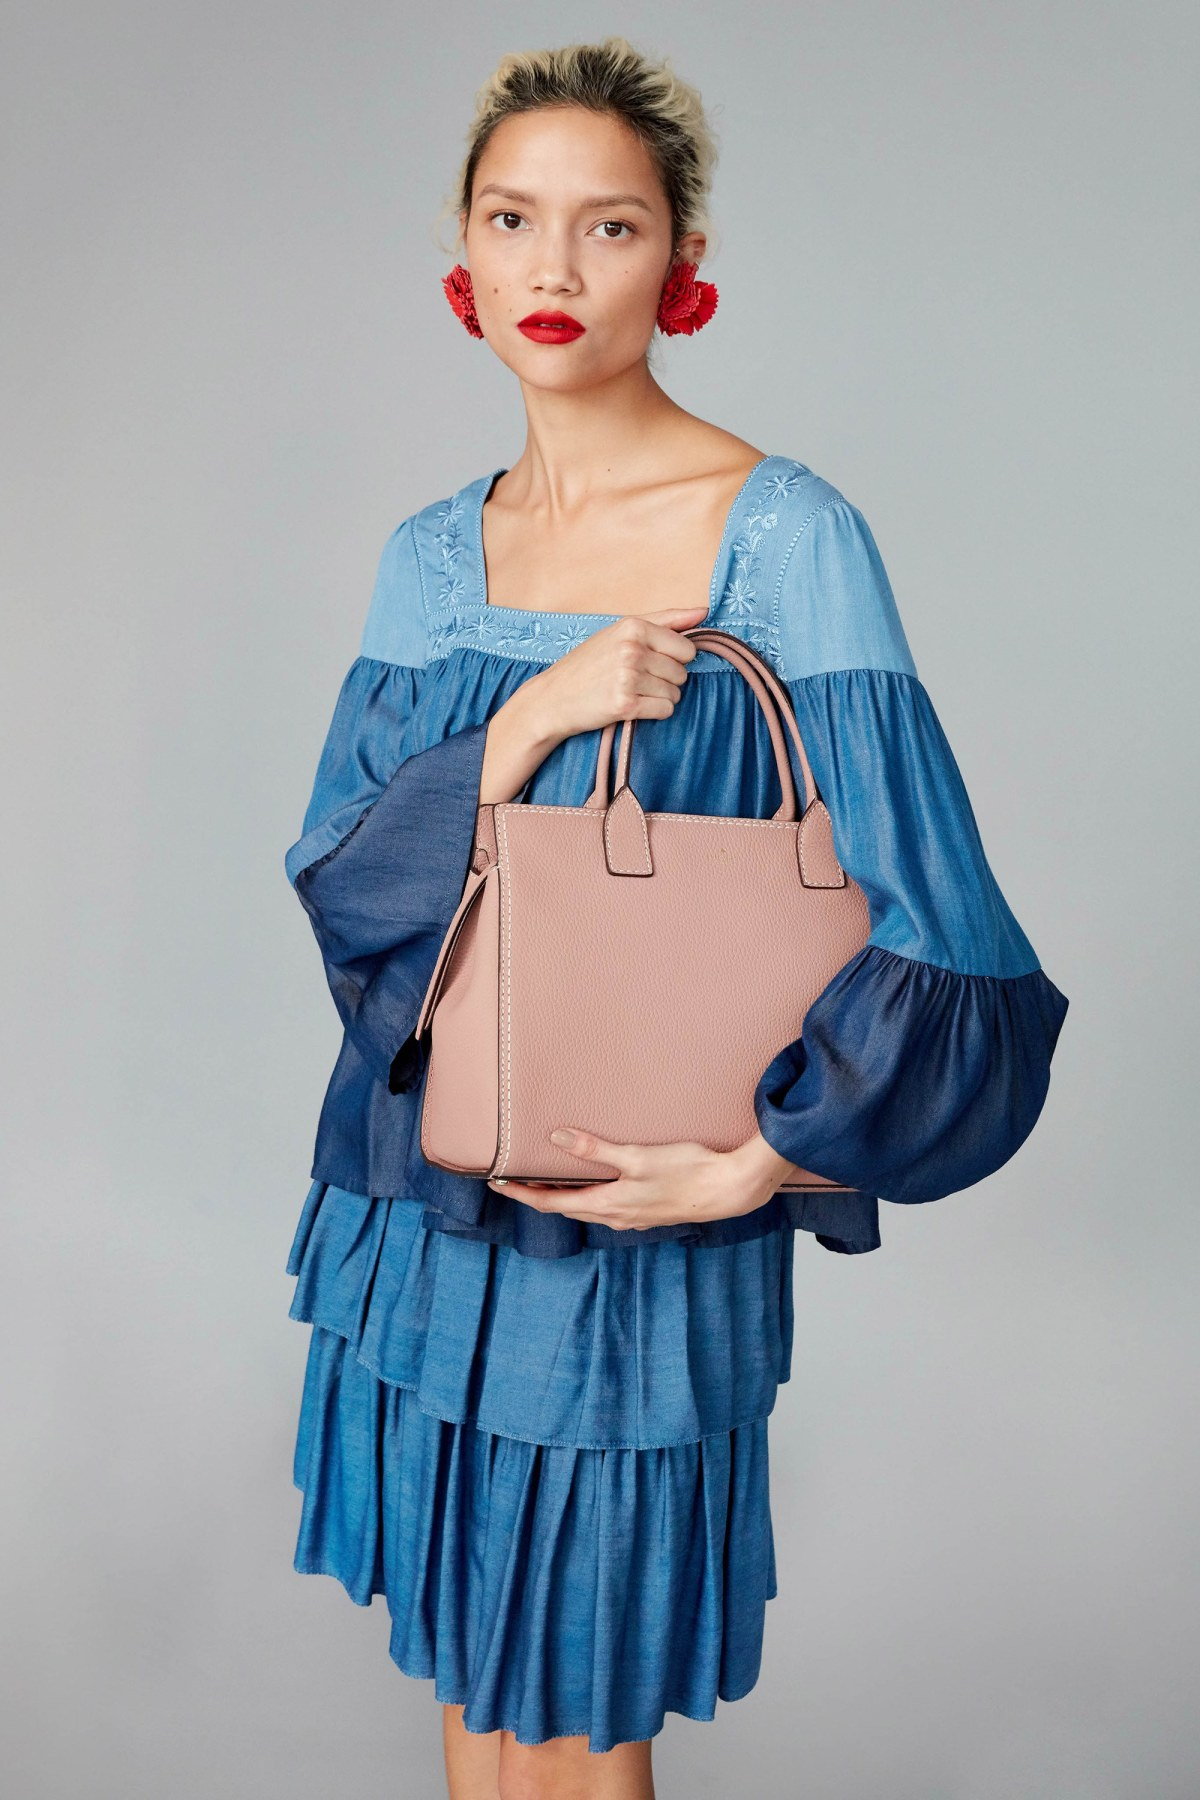 kate-spade-pre-fall-2017-fashion-show-the-impression-20